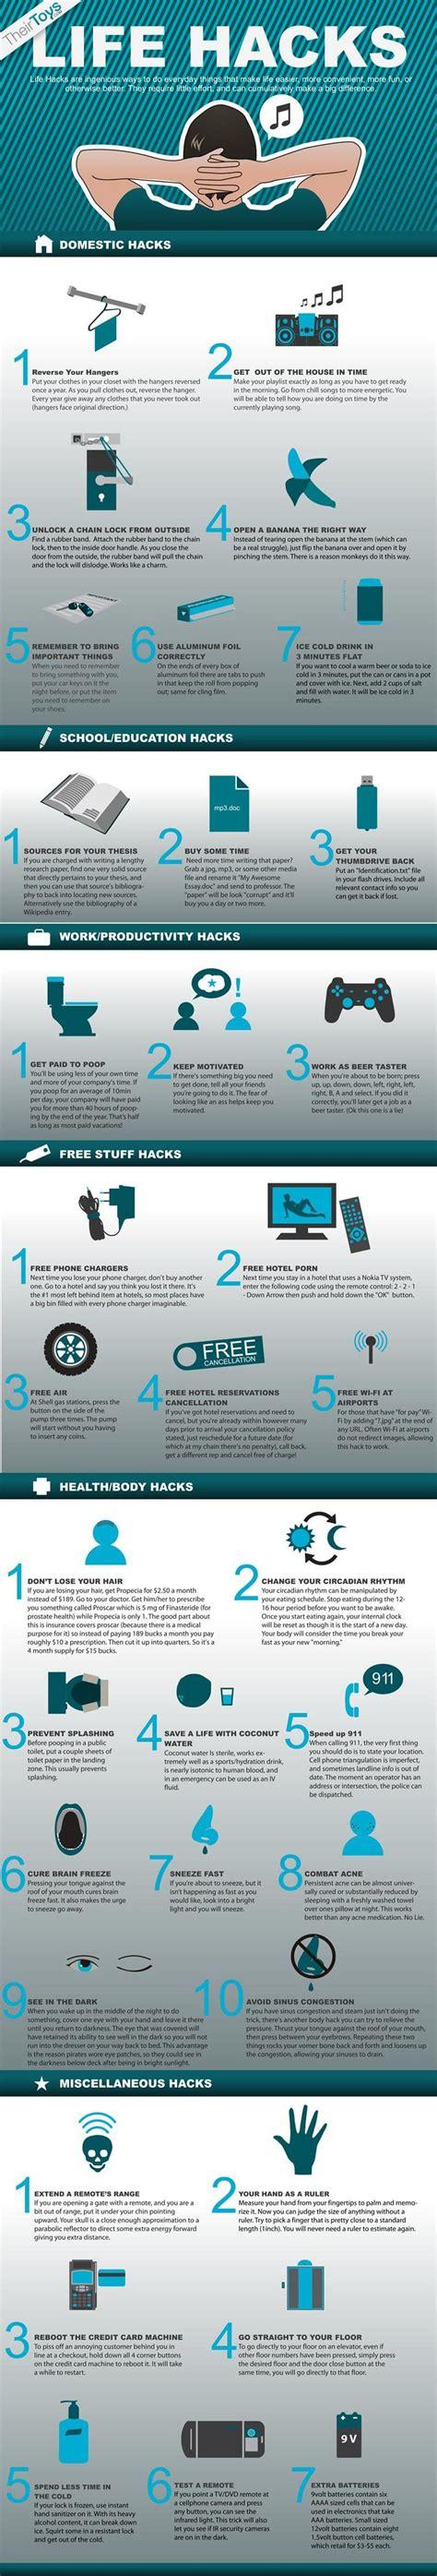 easy life hacks fundalize com toon onderwerp lifehacks